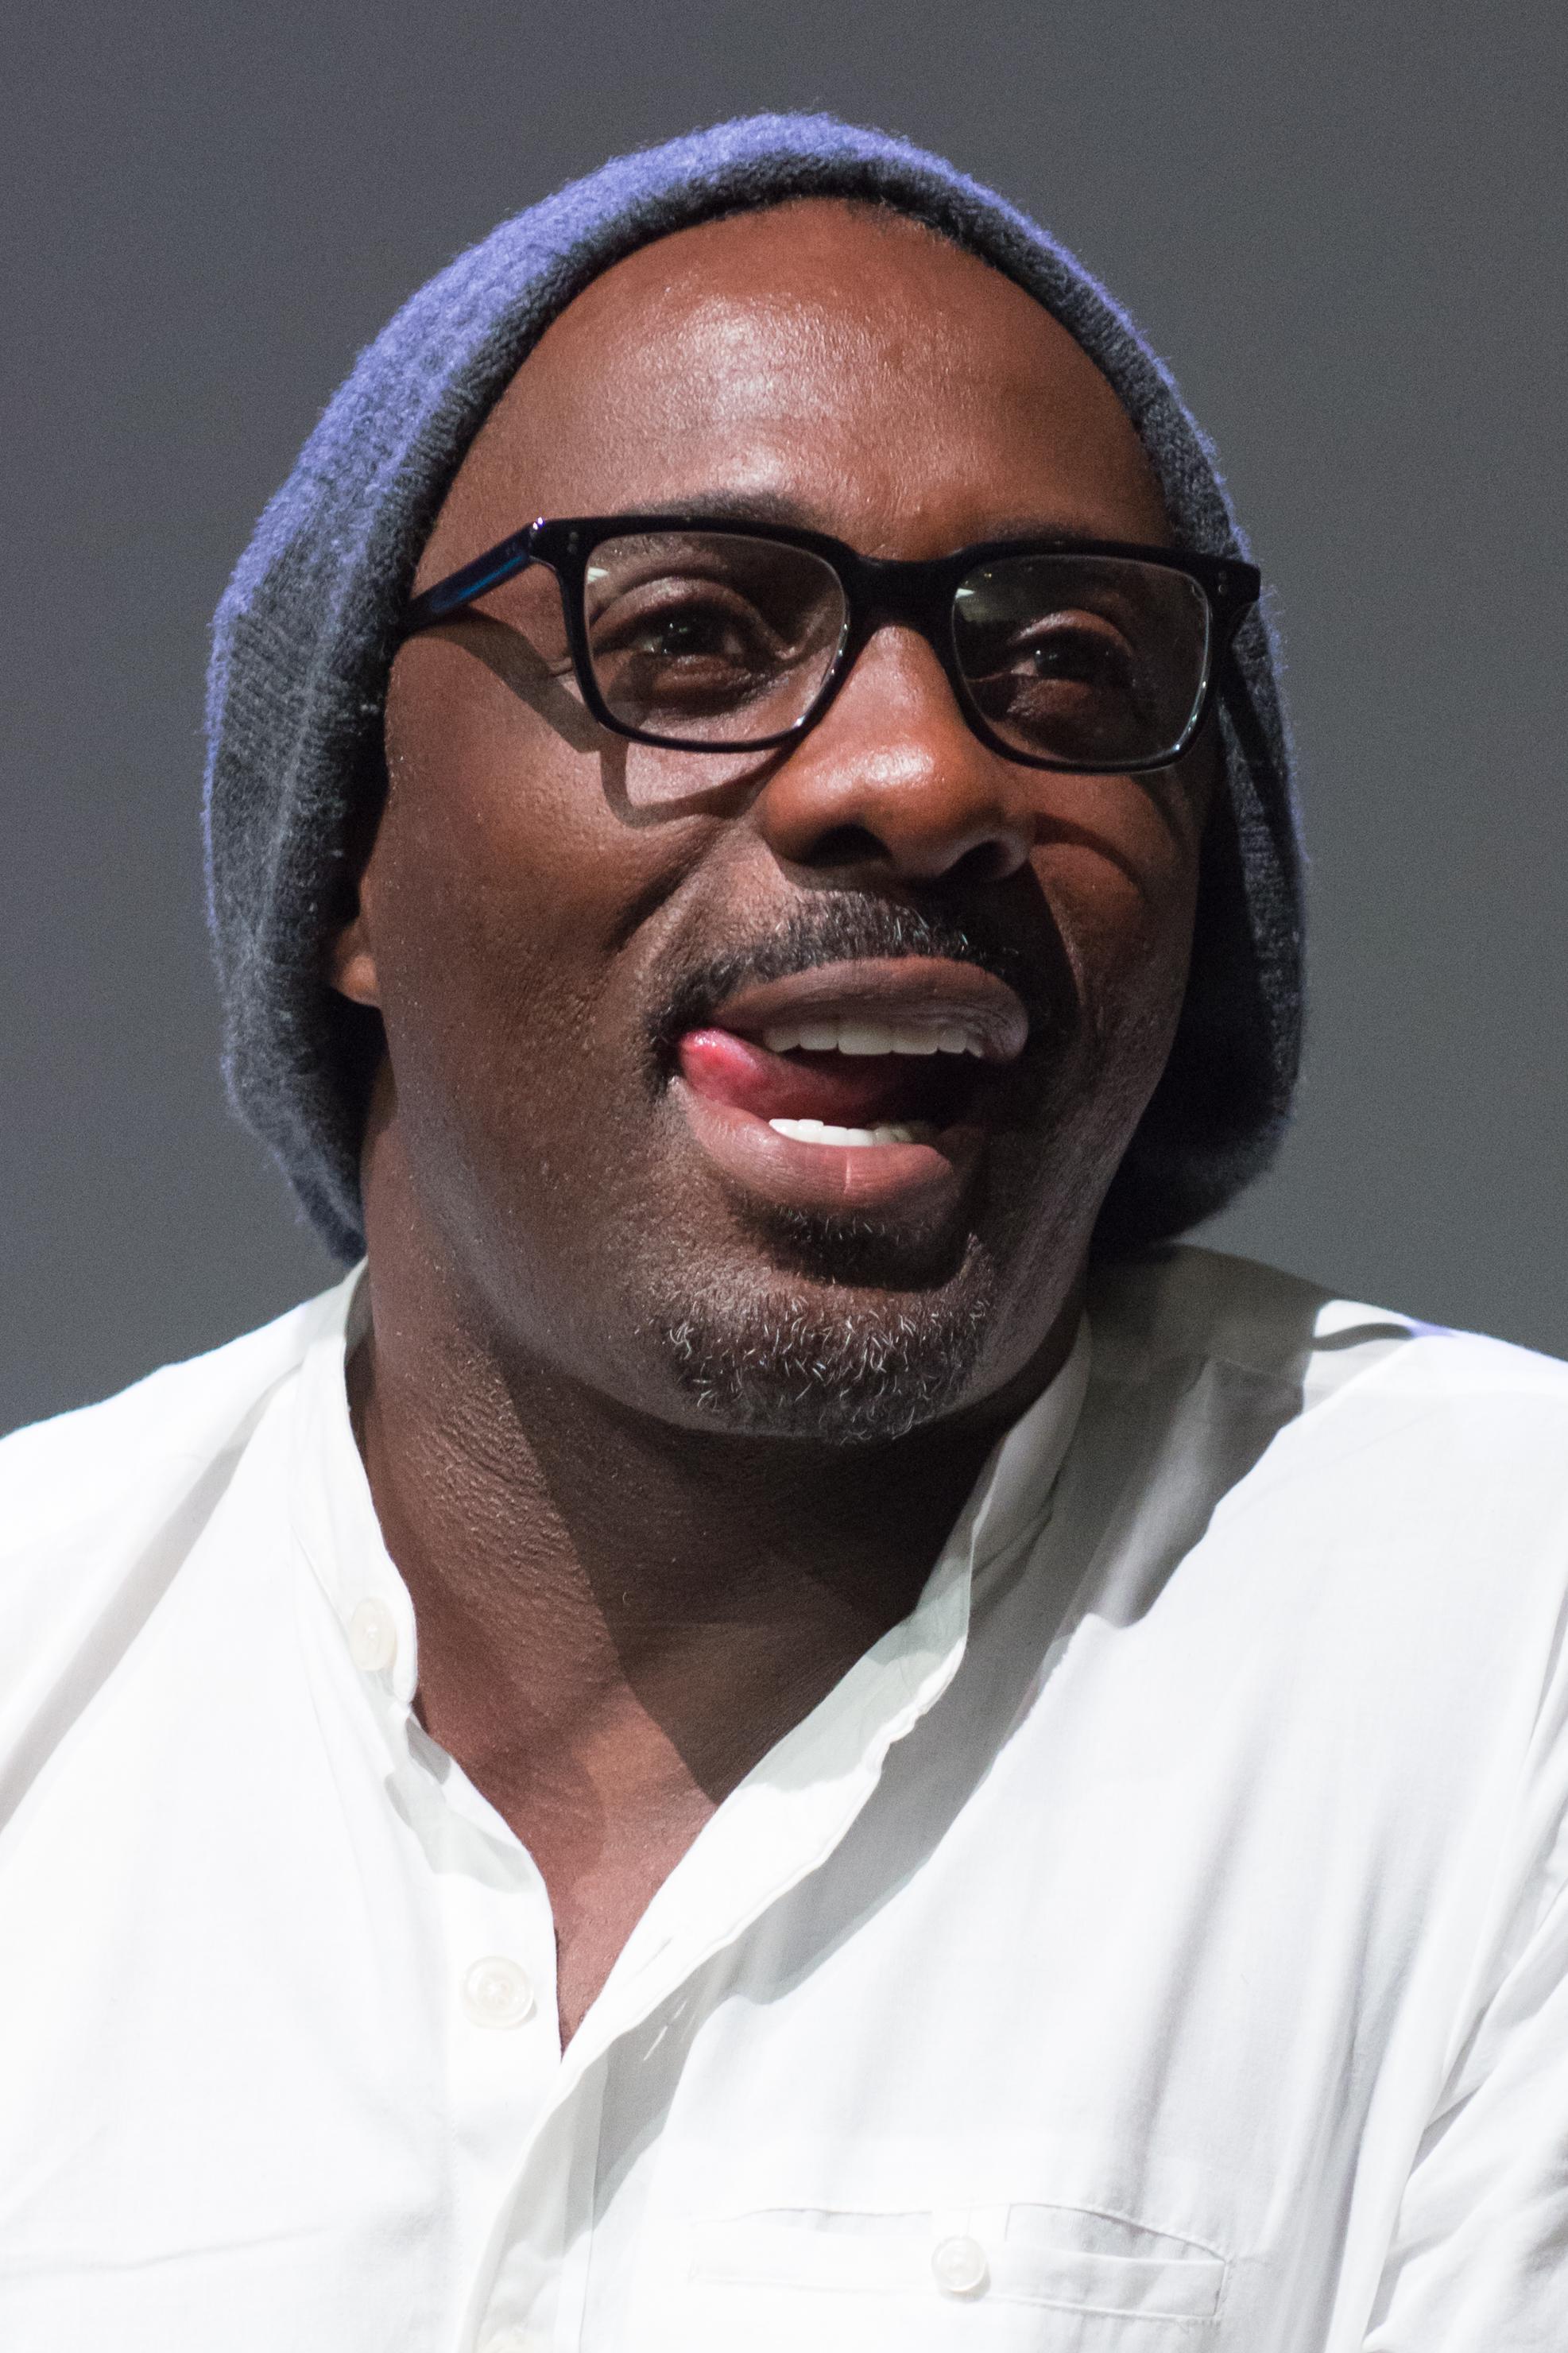 Apple Store Soho Presents: Meet The Actor - Idris Elba 'Pacific Rim'